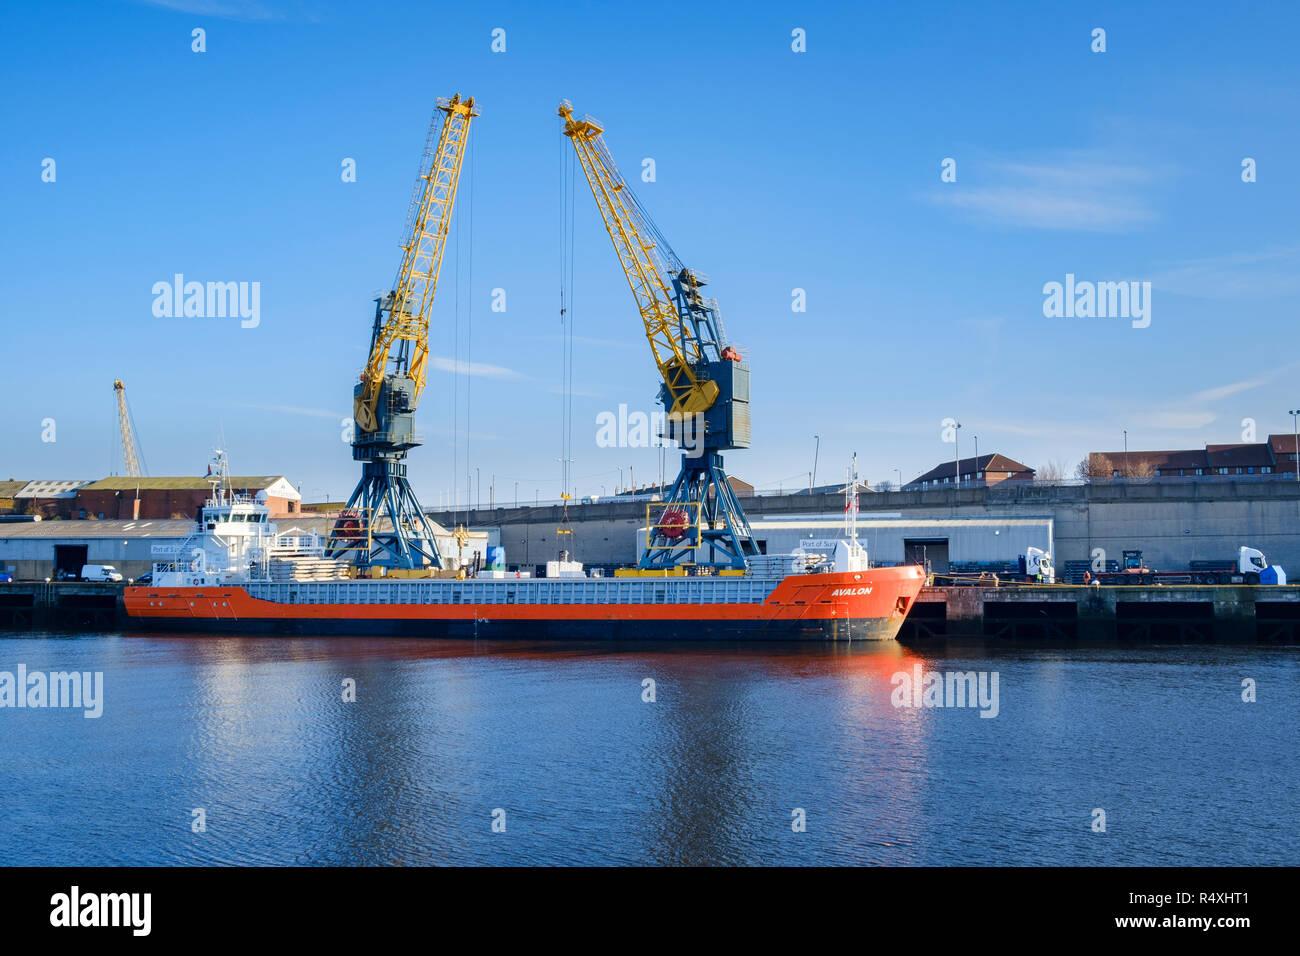 Import - Export - Port of Sunderland dock cranes on the river Wear loading cargo on general cargo ship MV Avalon merchant vessel built 2009 - Stock Image